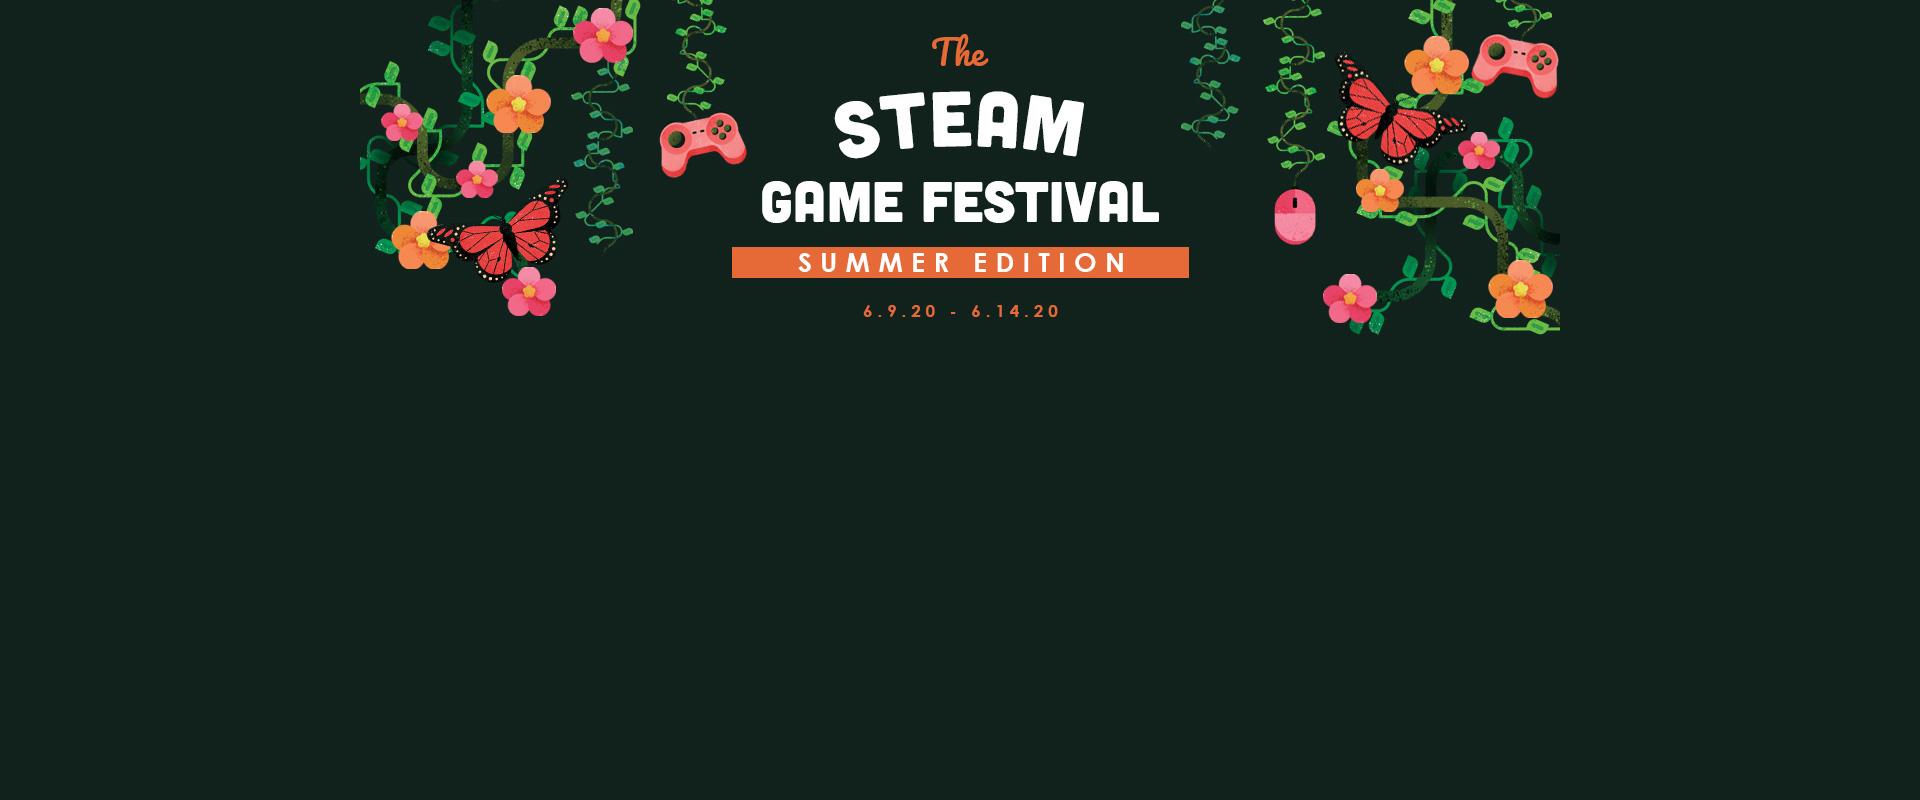 Steam Game Festival, Summer Edition